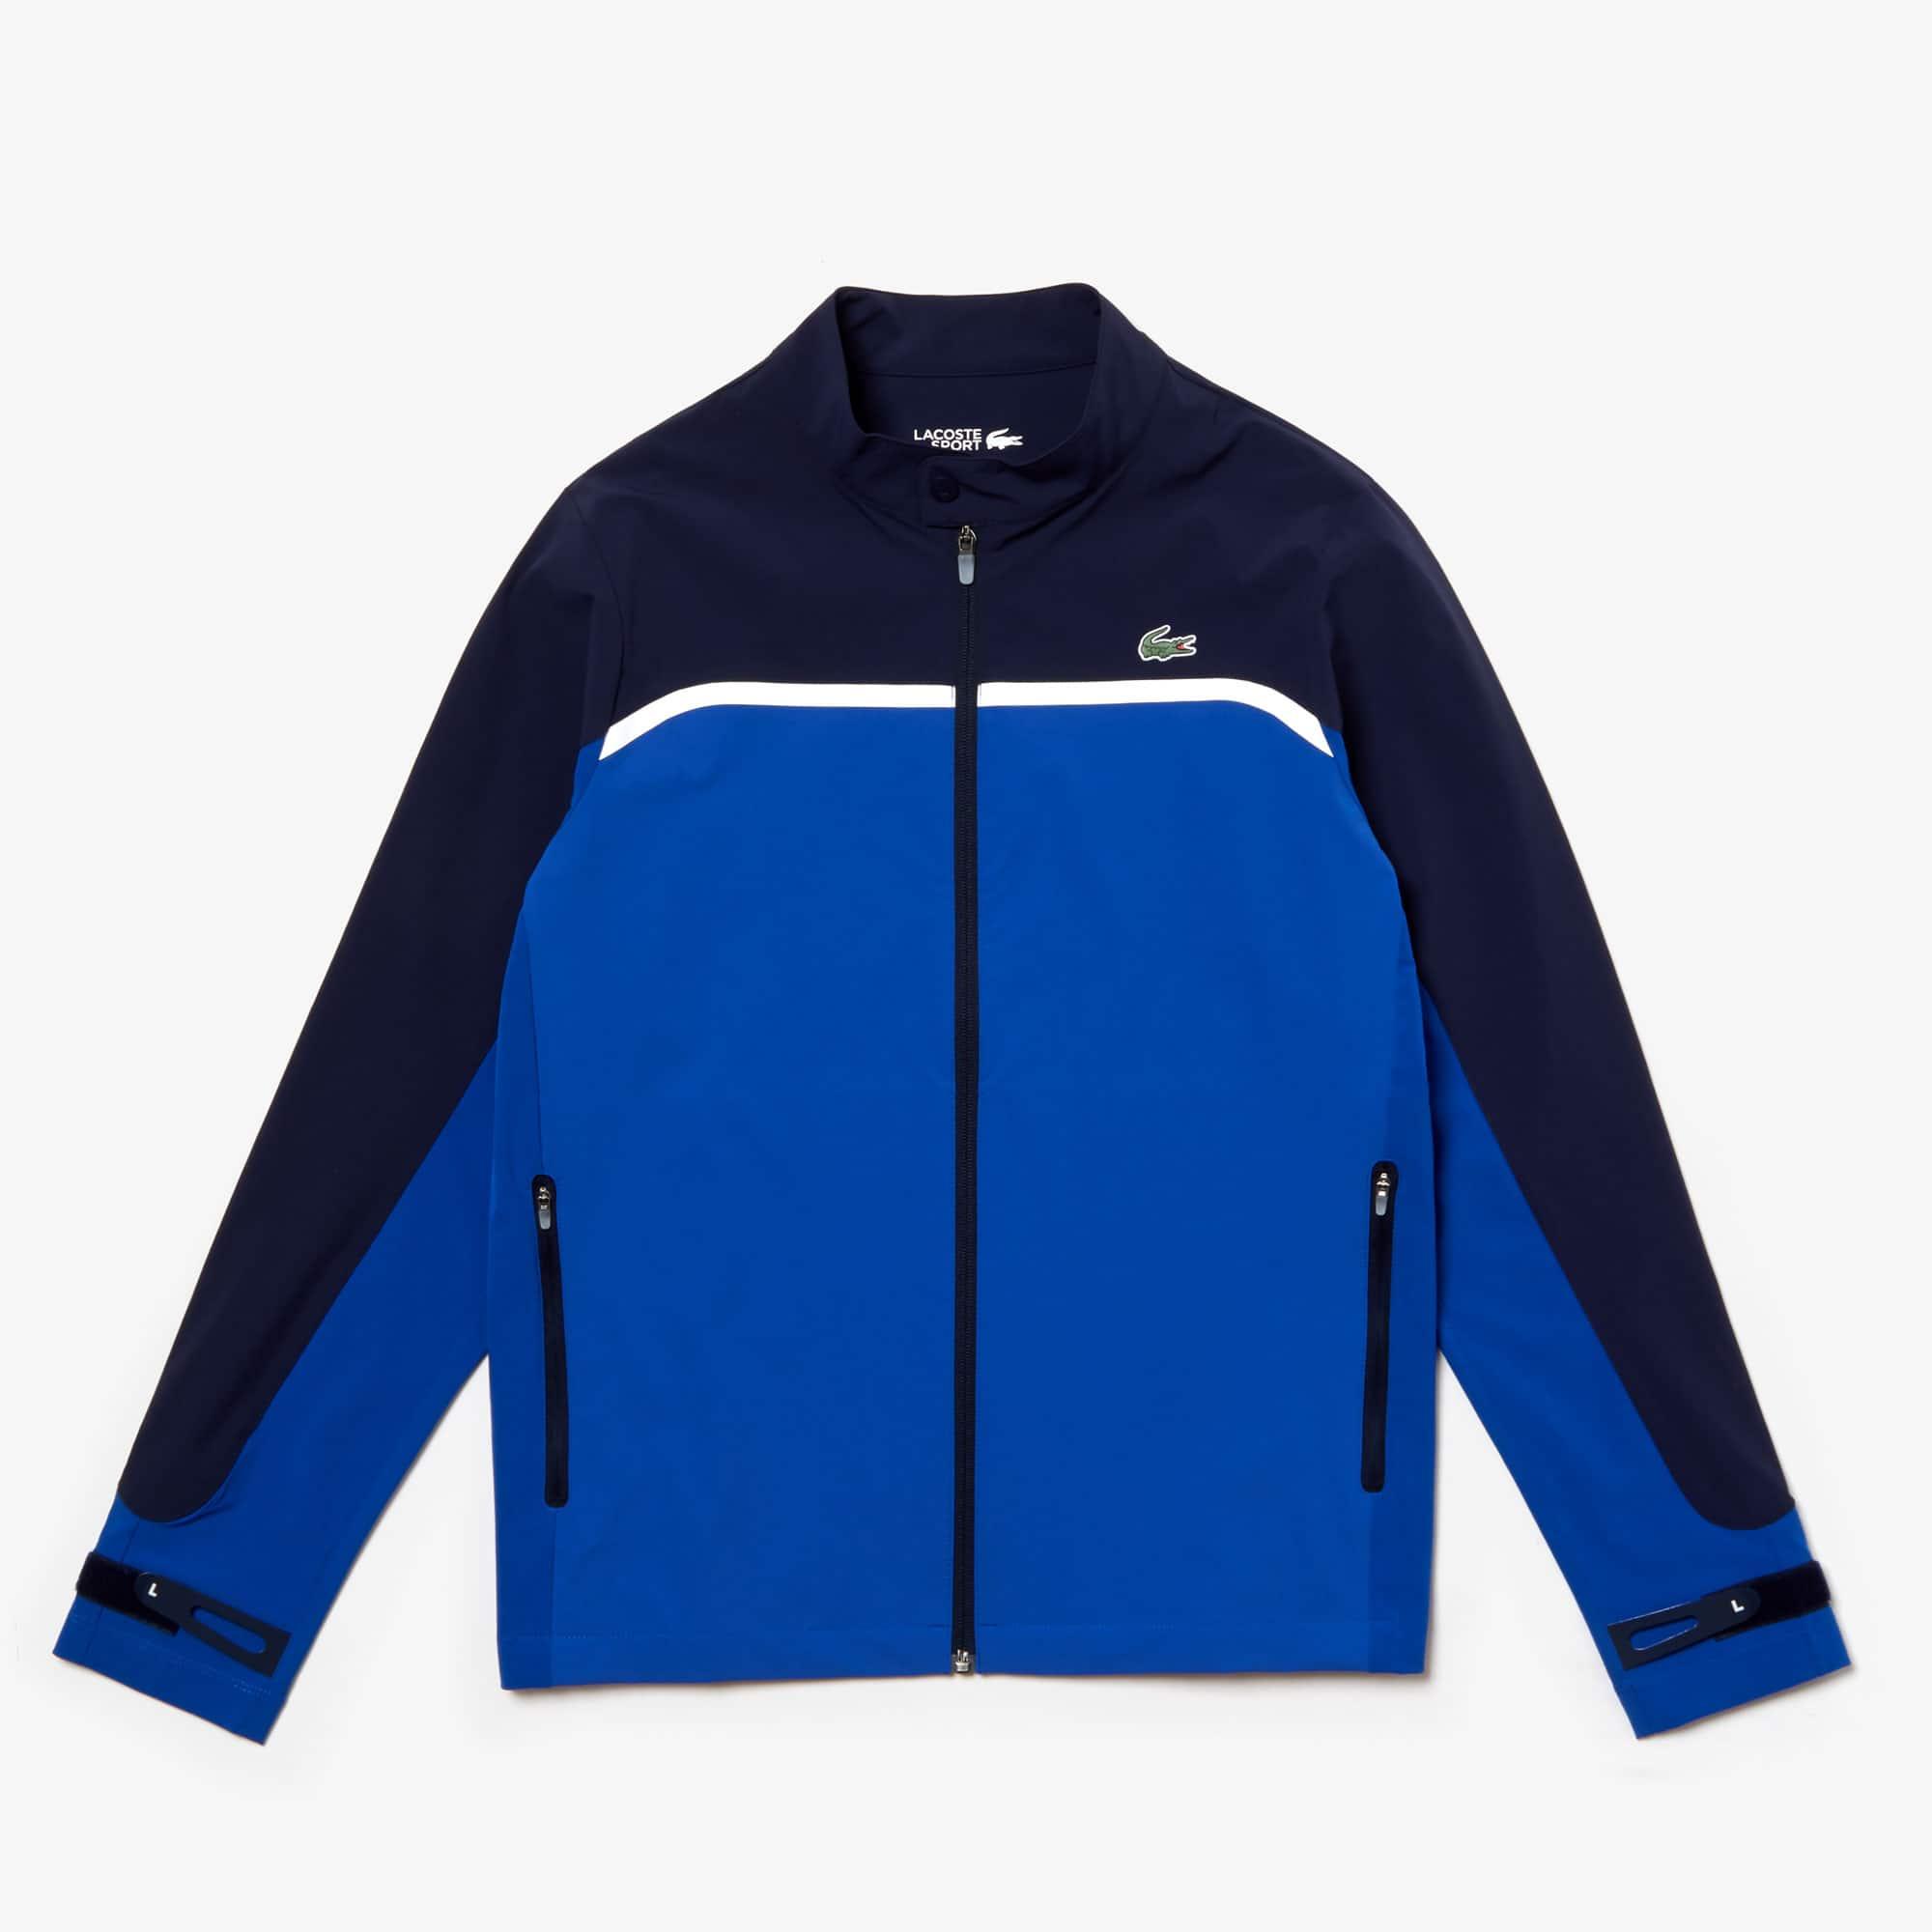 Lacoste Jackets Men's SPORT Color-Blocked Lightweight Stretch Zip Jacket